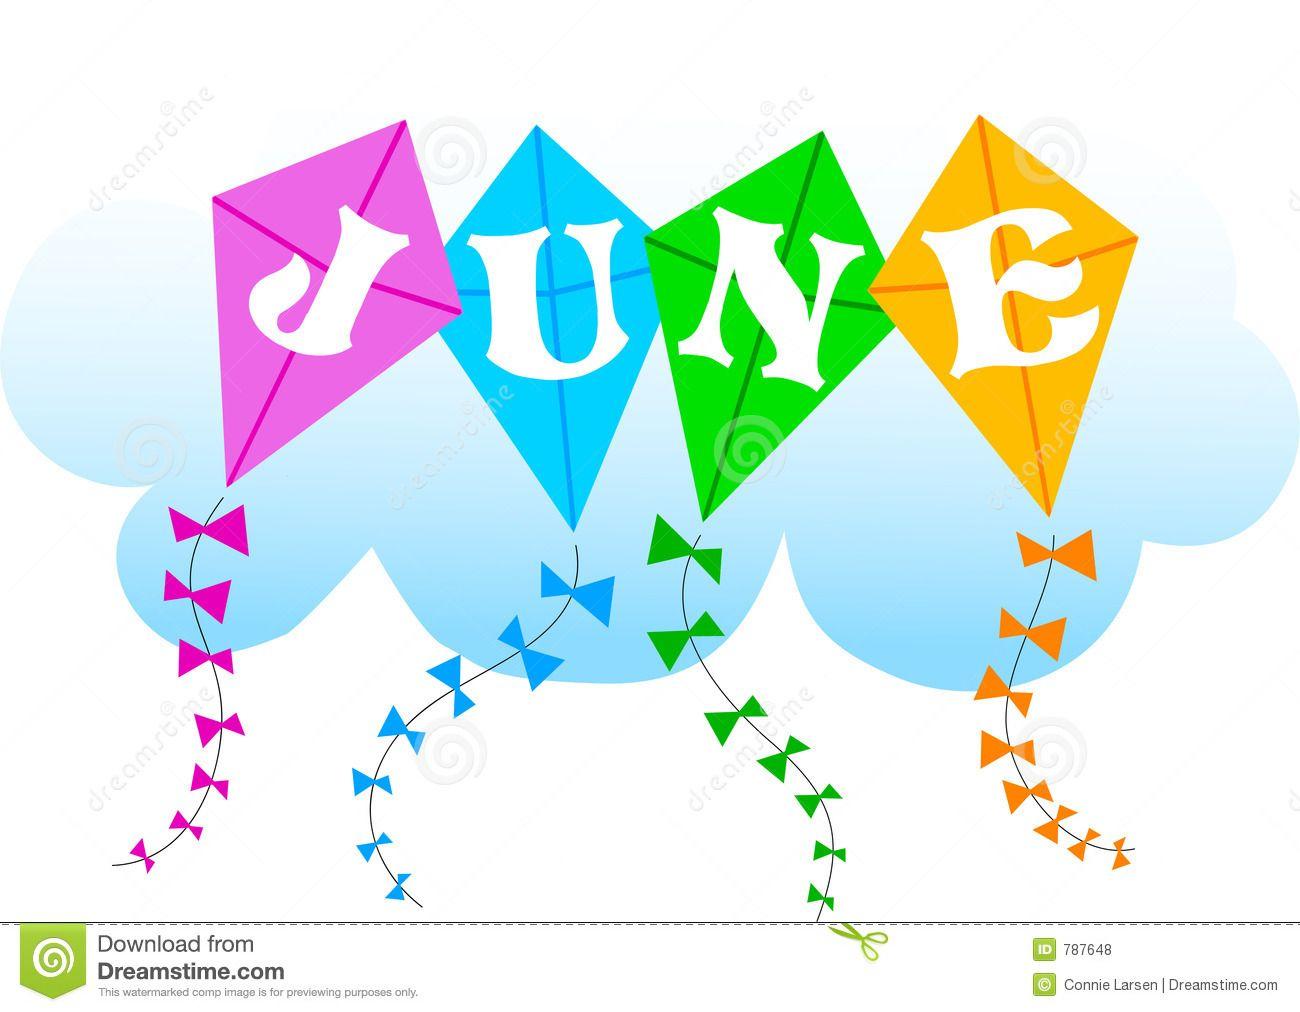 june clipart free images pictures photos wallpapers download http rh pinterest com june clip art symbols june clip art photos